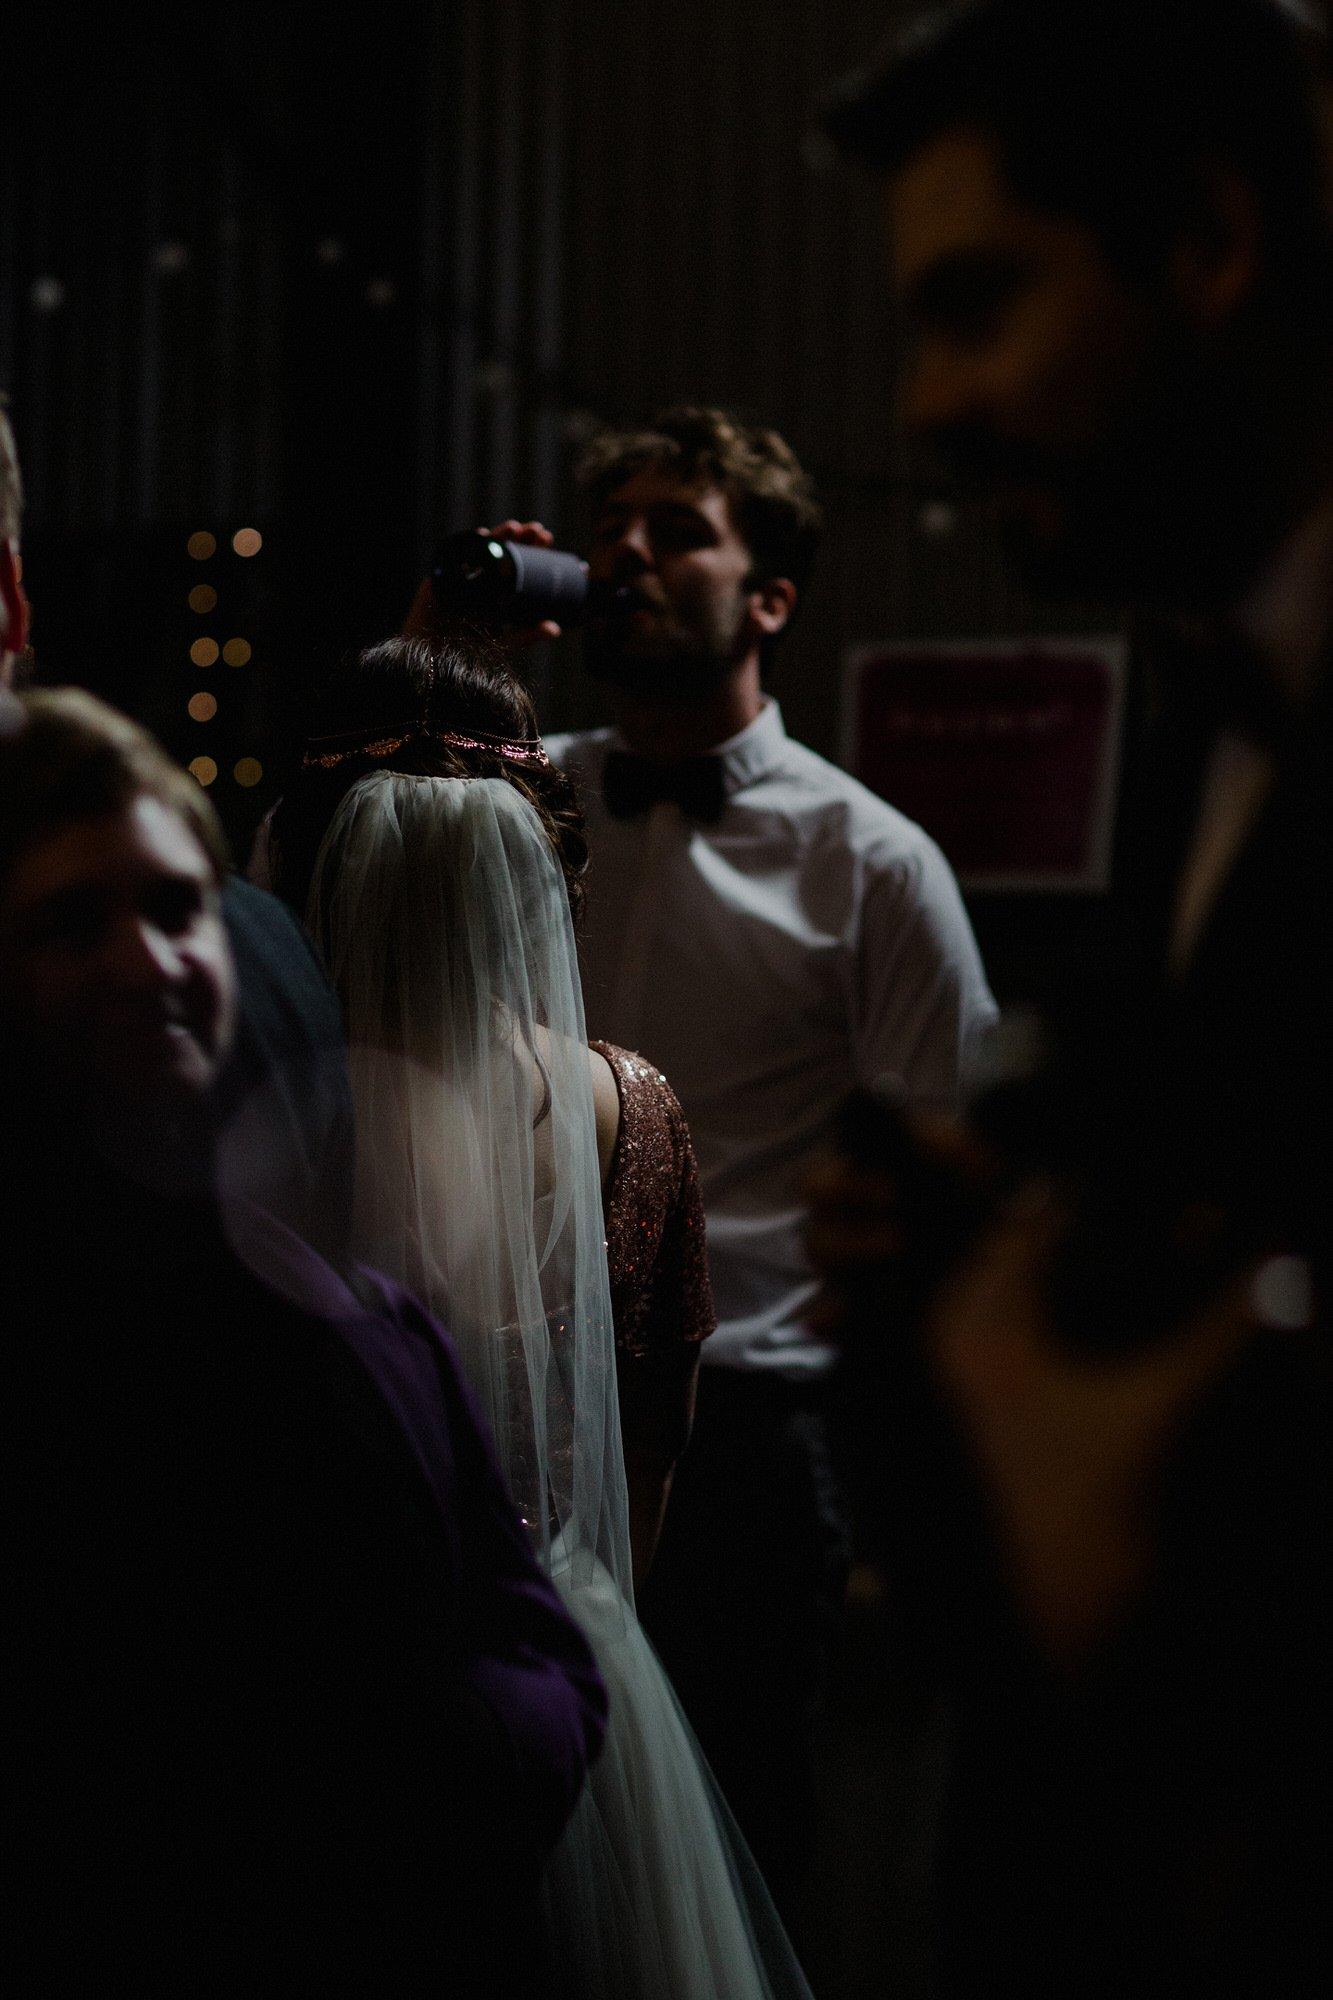 052 TIN SHED KNOCKRAICH FARM WEDDING ALTERNATIVE BRIDE ZOE ALEXANDRA PHOTOGRAPHY